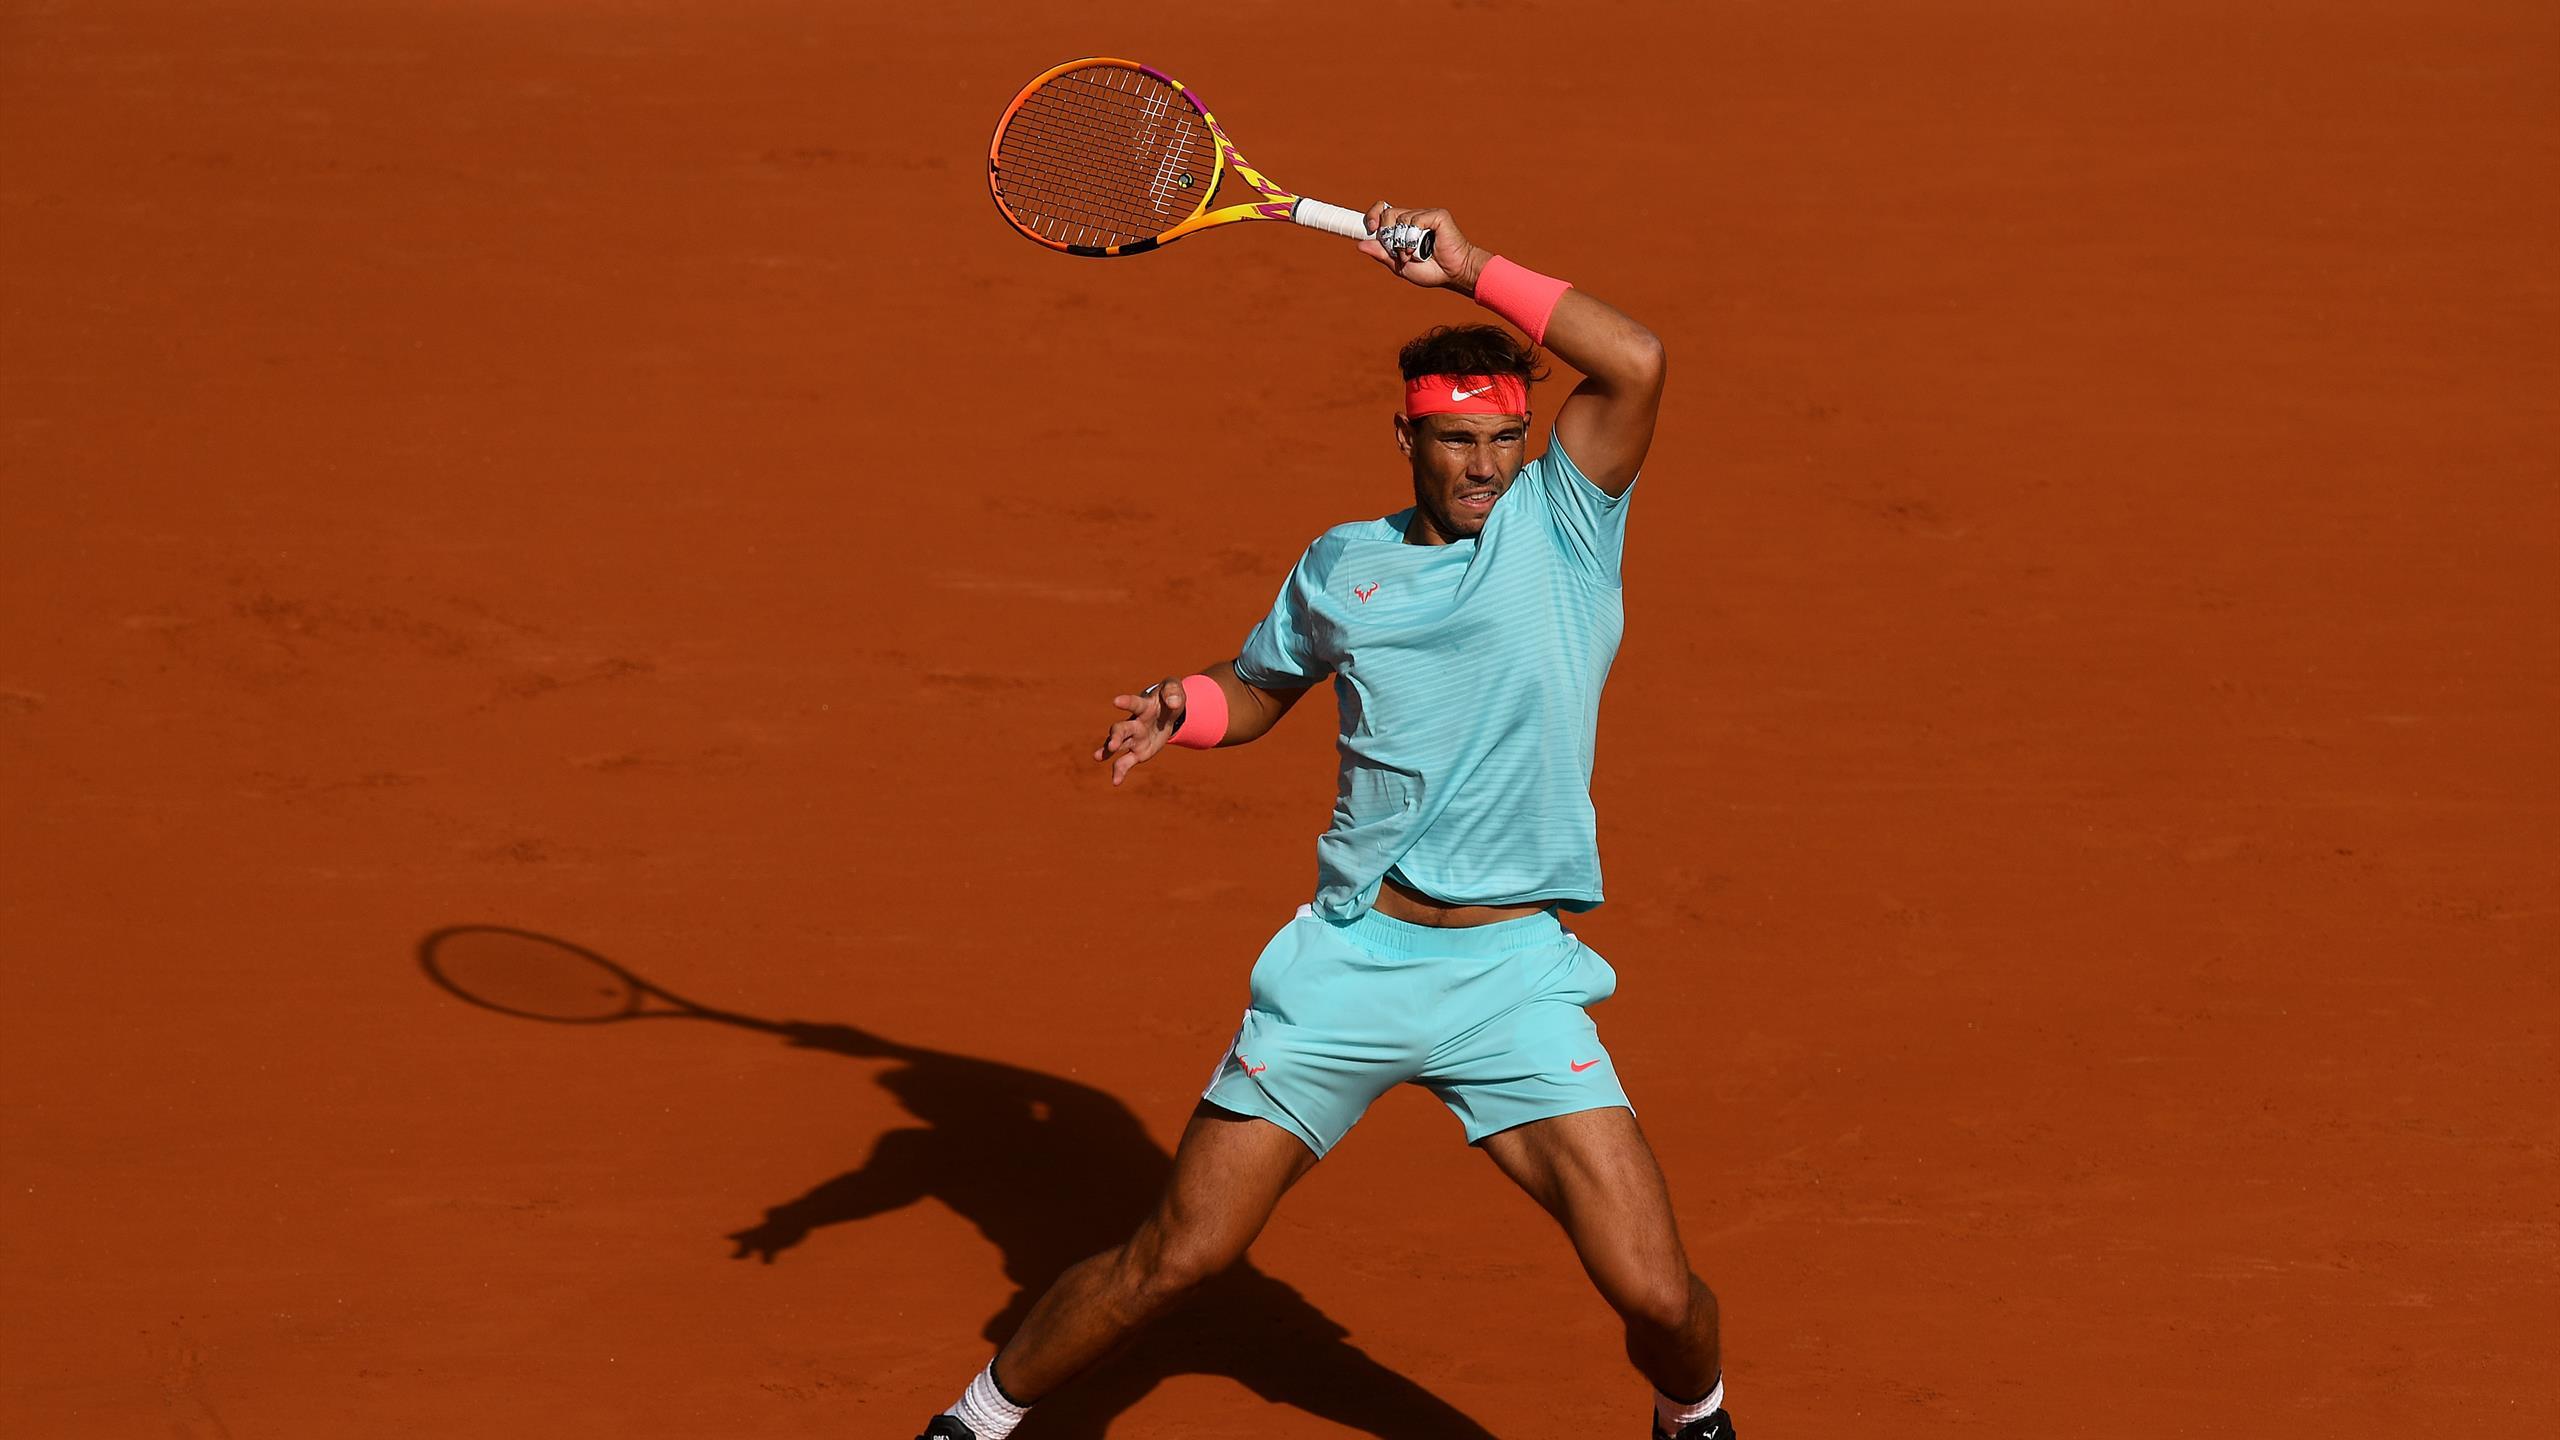 French Open 2020 Live Updates Videos Scores From Roland Garros Eurosport